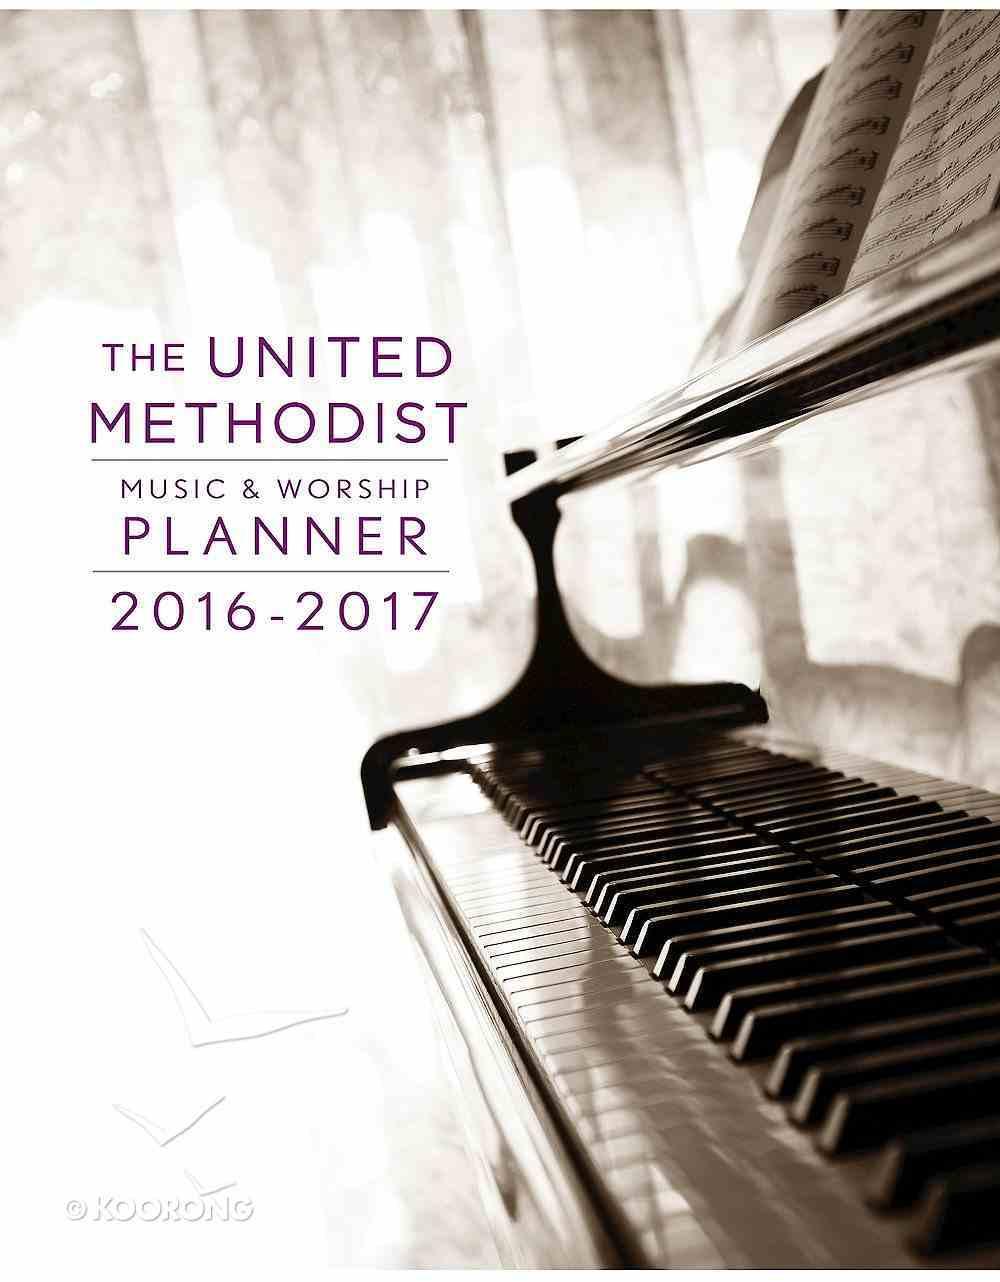 The United Methodist Music & Worship Planner 2016-2017 NRSV Edition eBook